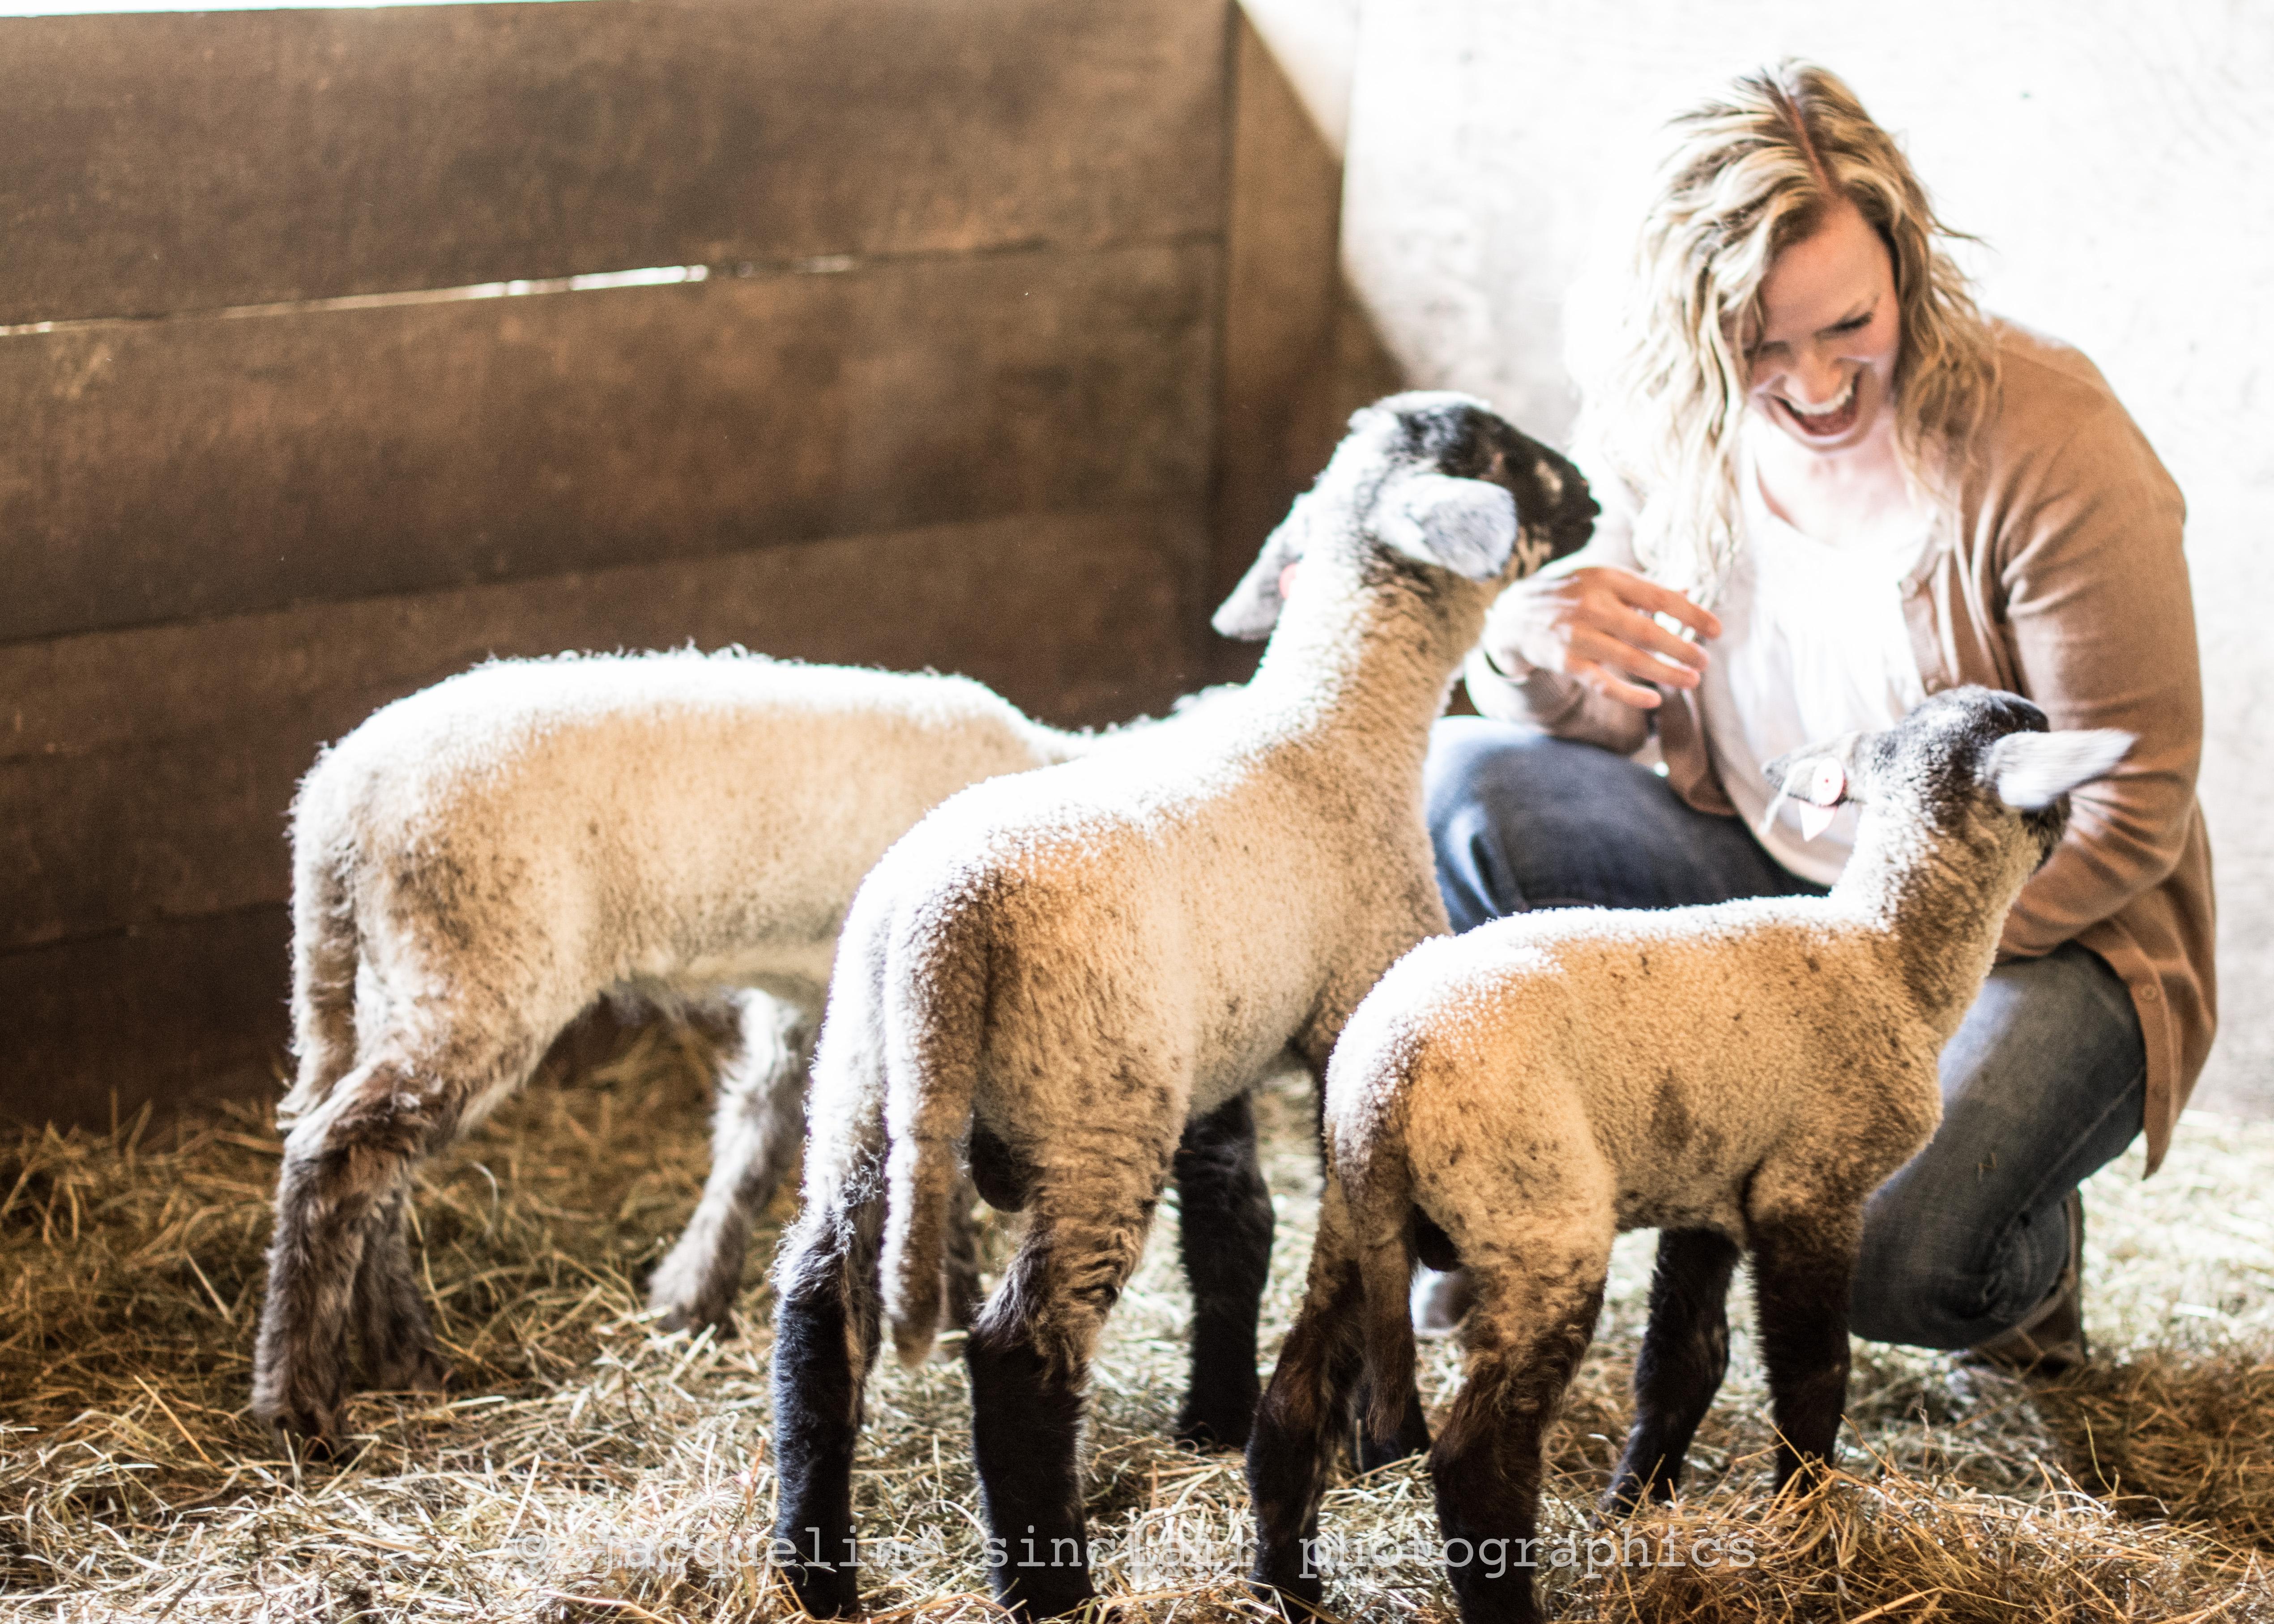 Wallpaper Animals Farm Baby Barn Straw Sheep Hay Lamb Ears Livestock Alpaca Selfie Pasture Llama Herd Babies Cow Goat Family Camel Like Mammal Lambs 5081x3629 874373 Hd Wallpapers Wallhere